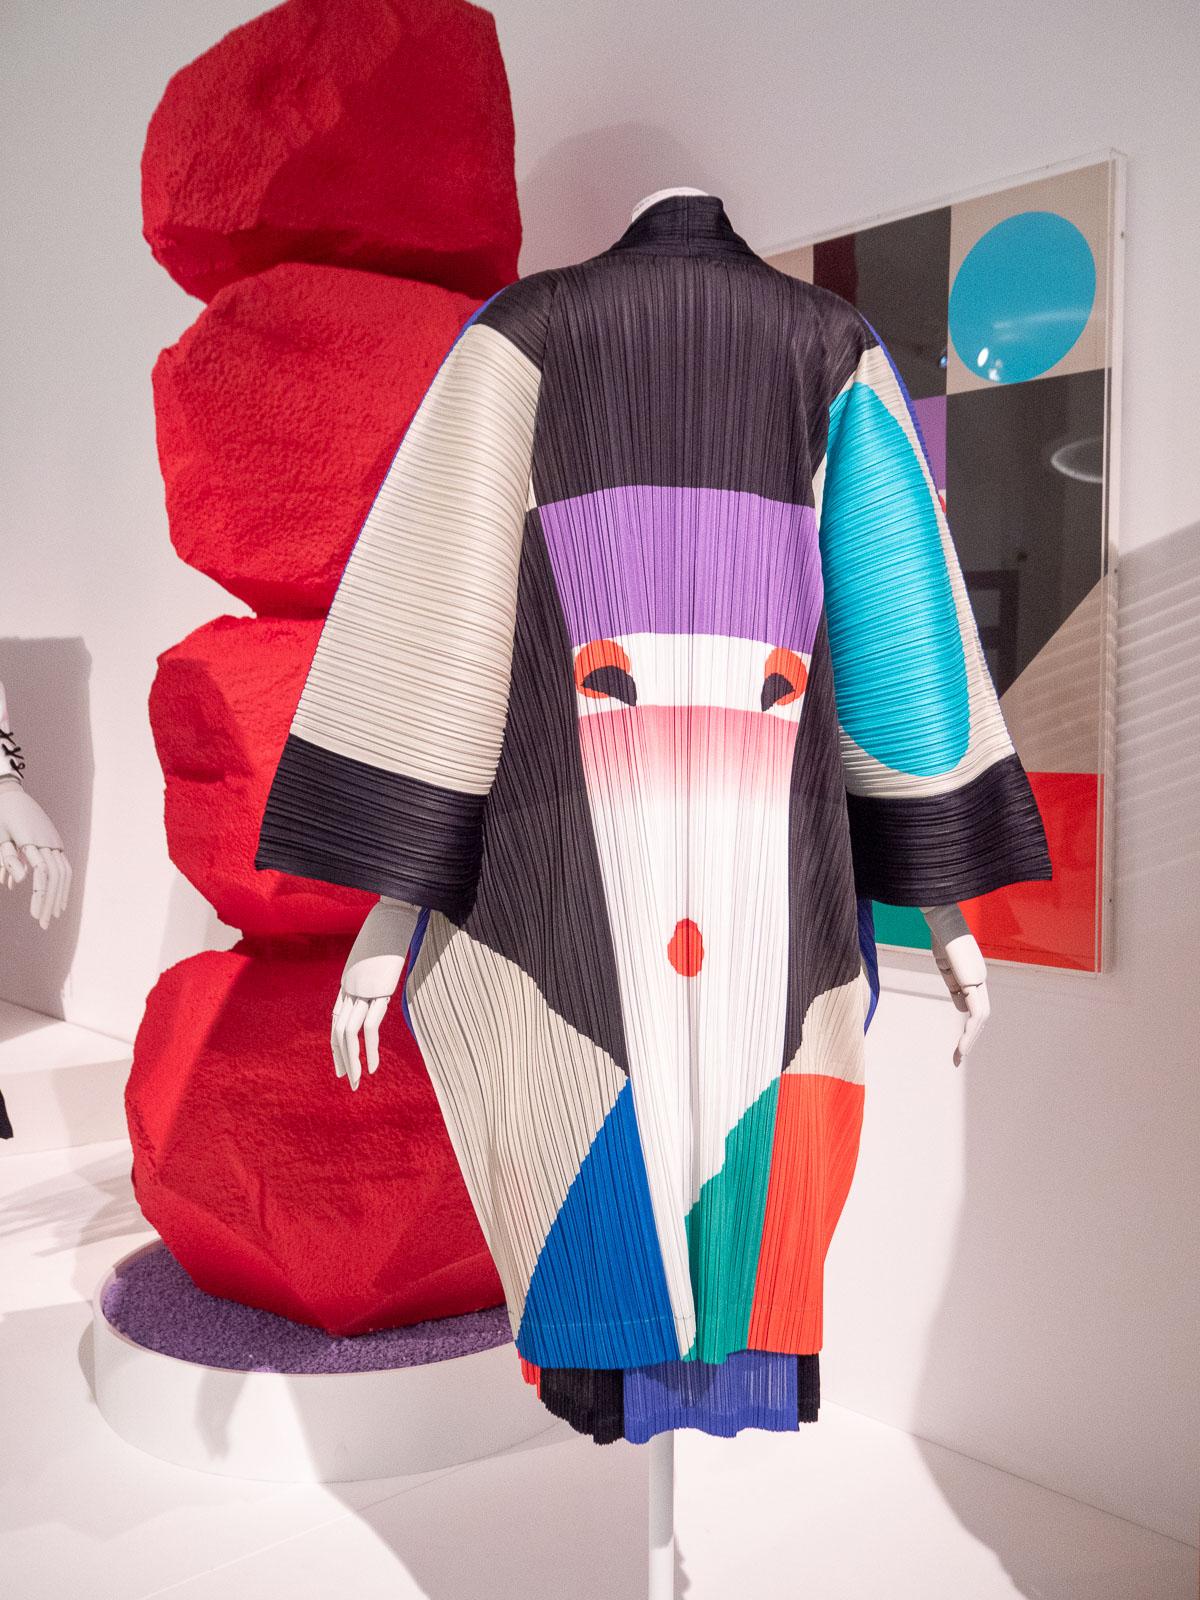 V&A Museum, V&A, Fashion Exhibition, Kimono: Kyoto to Catwalk, Kimono, Japanese Fashion